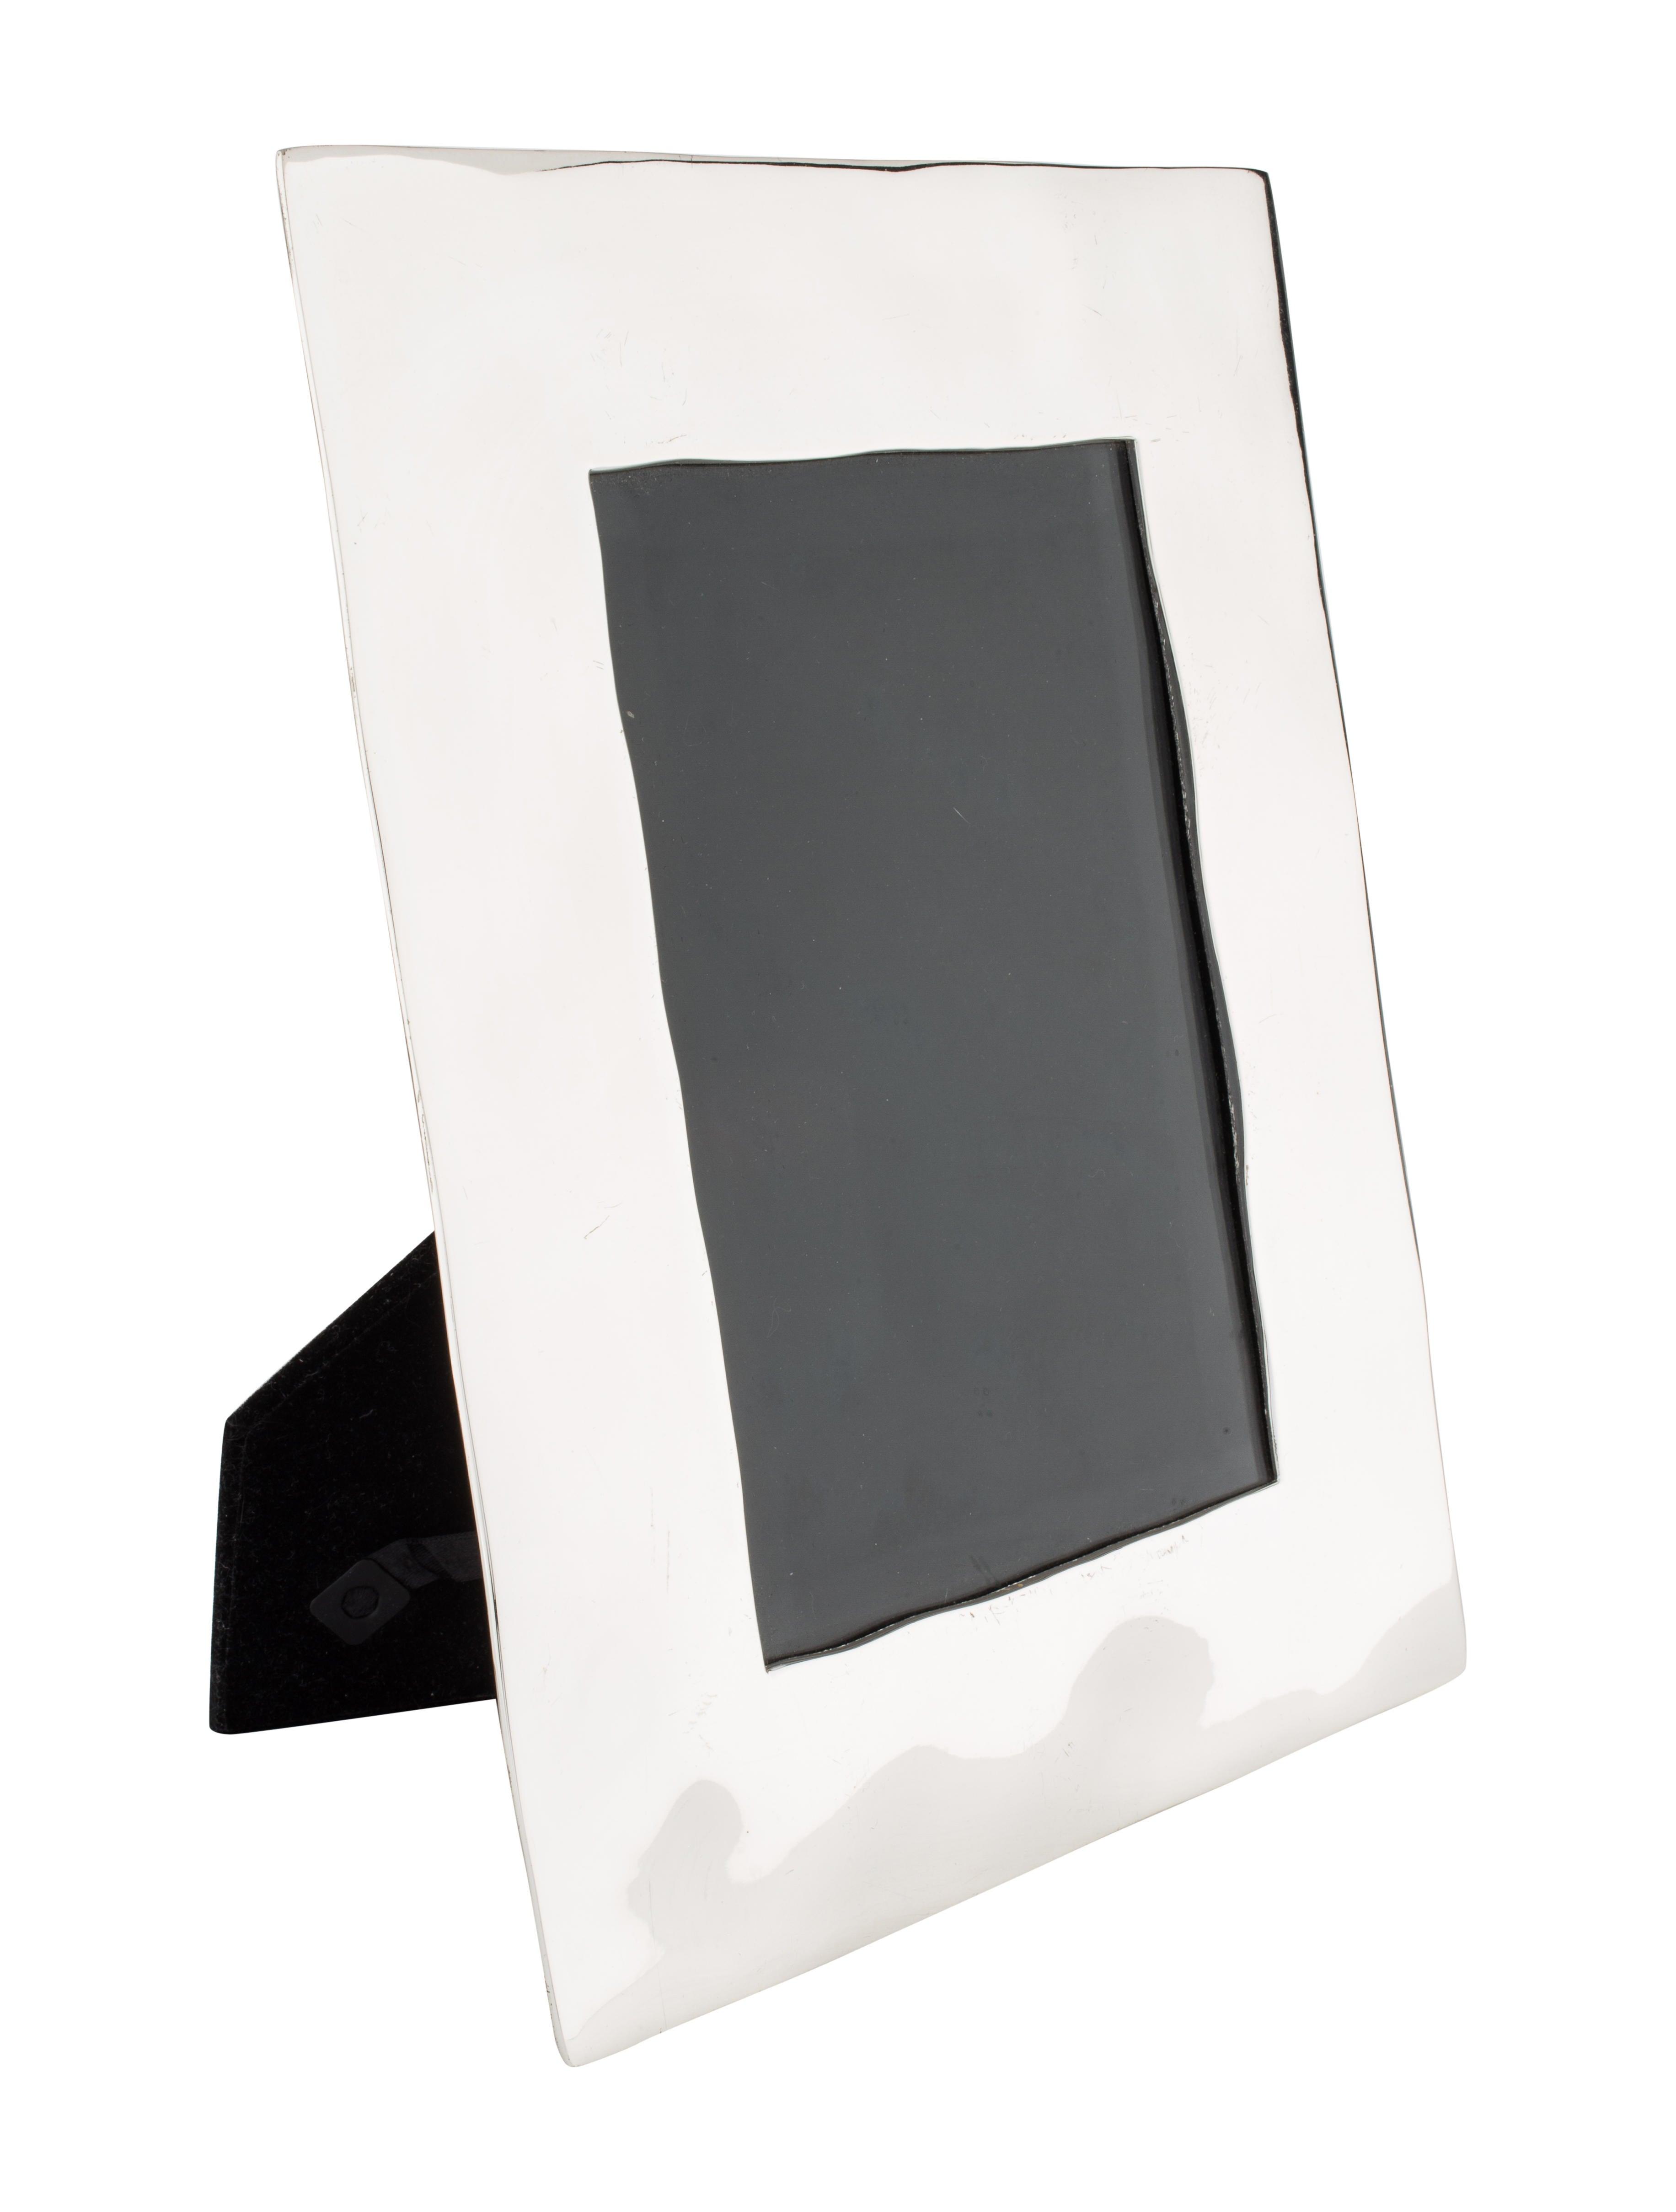 Unique Michael Aram Reflective Frame Ensign - Frame Photo Design ...